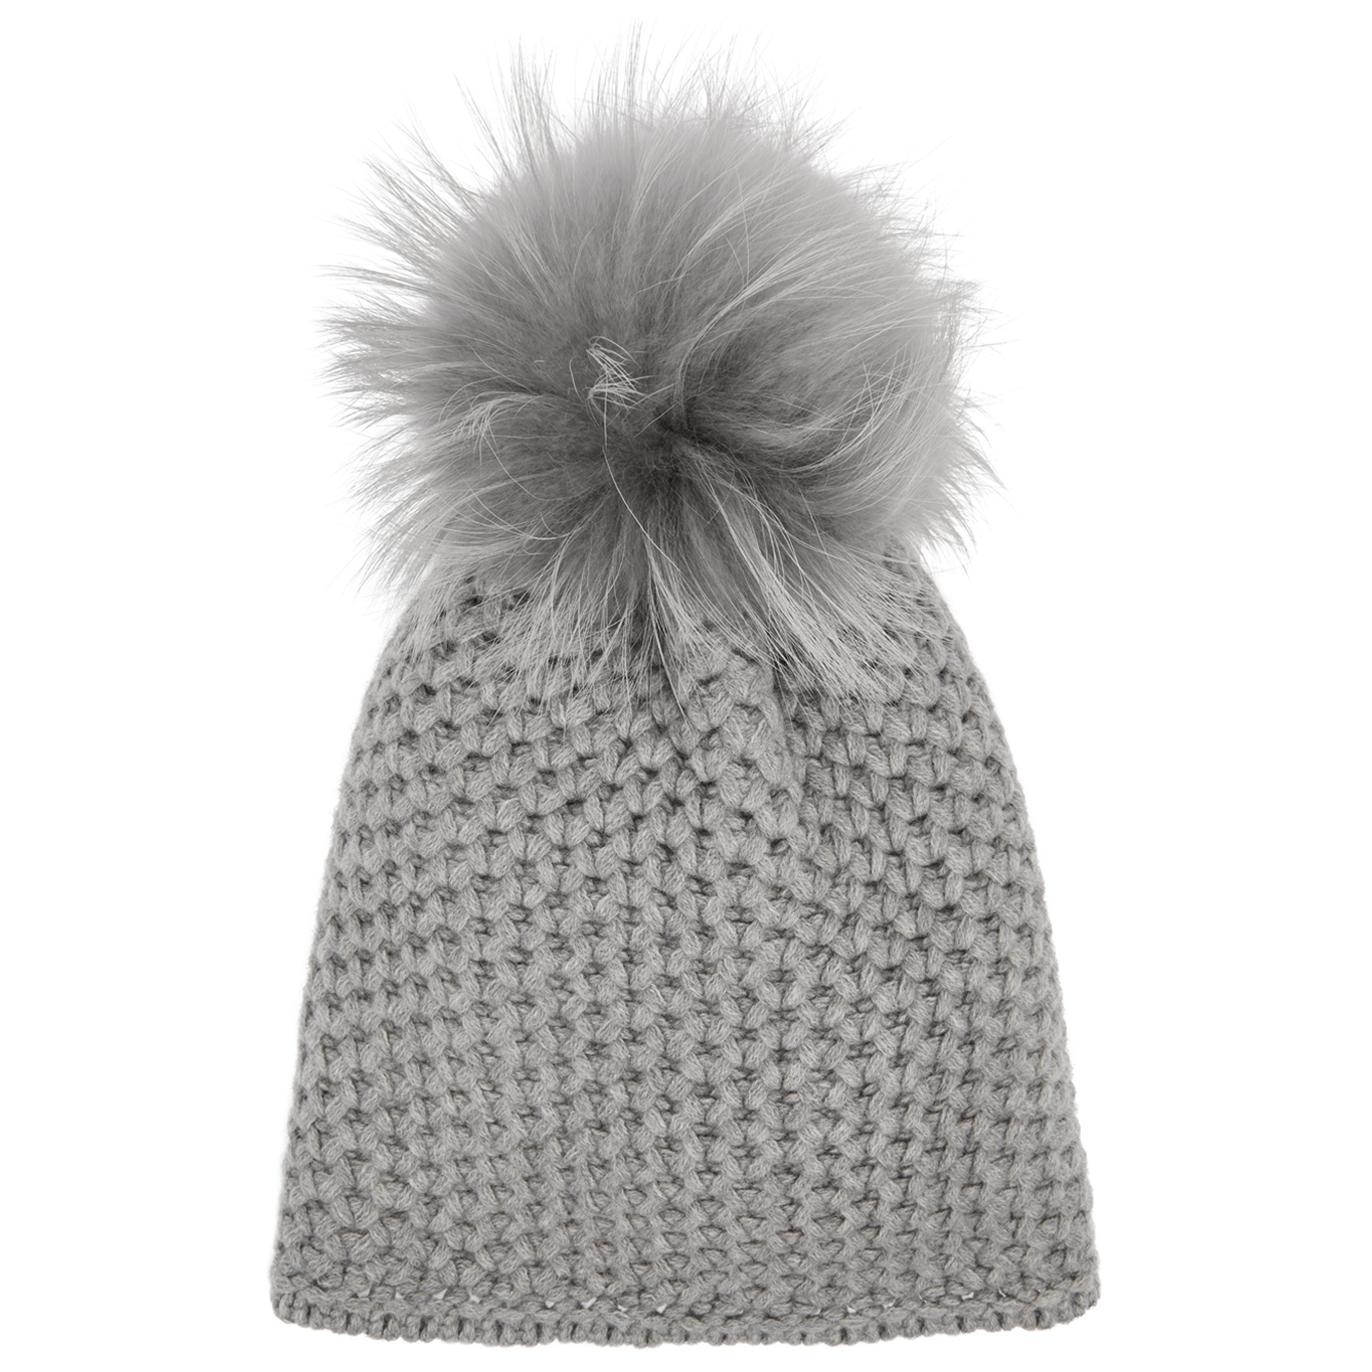 THATSAHAT! Grey pompom chunky-knit beanie - Harvey Nichols f27176201d6